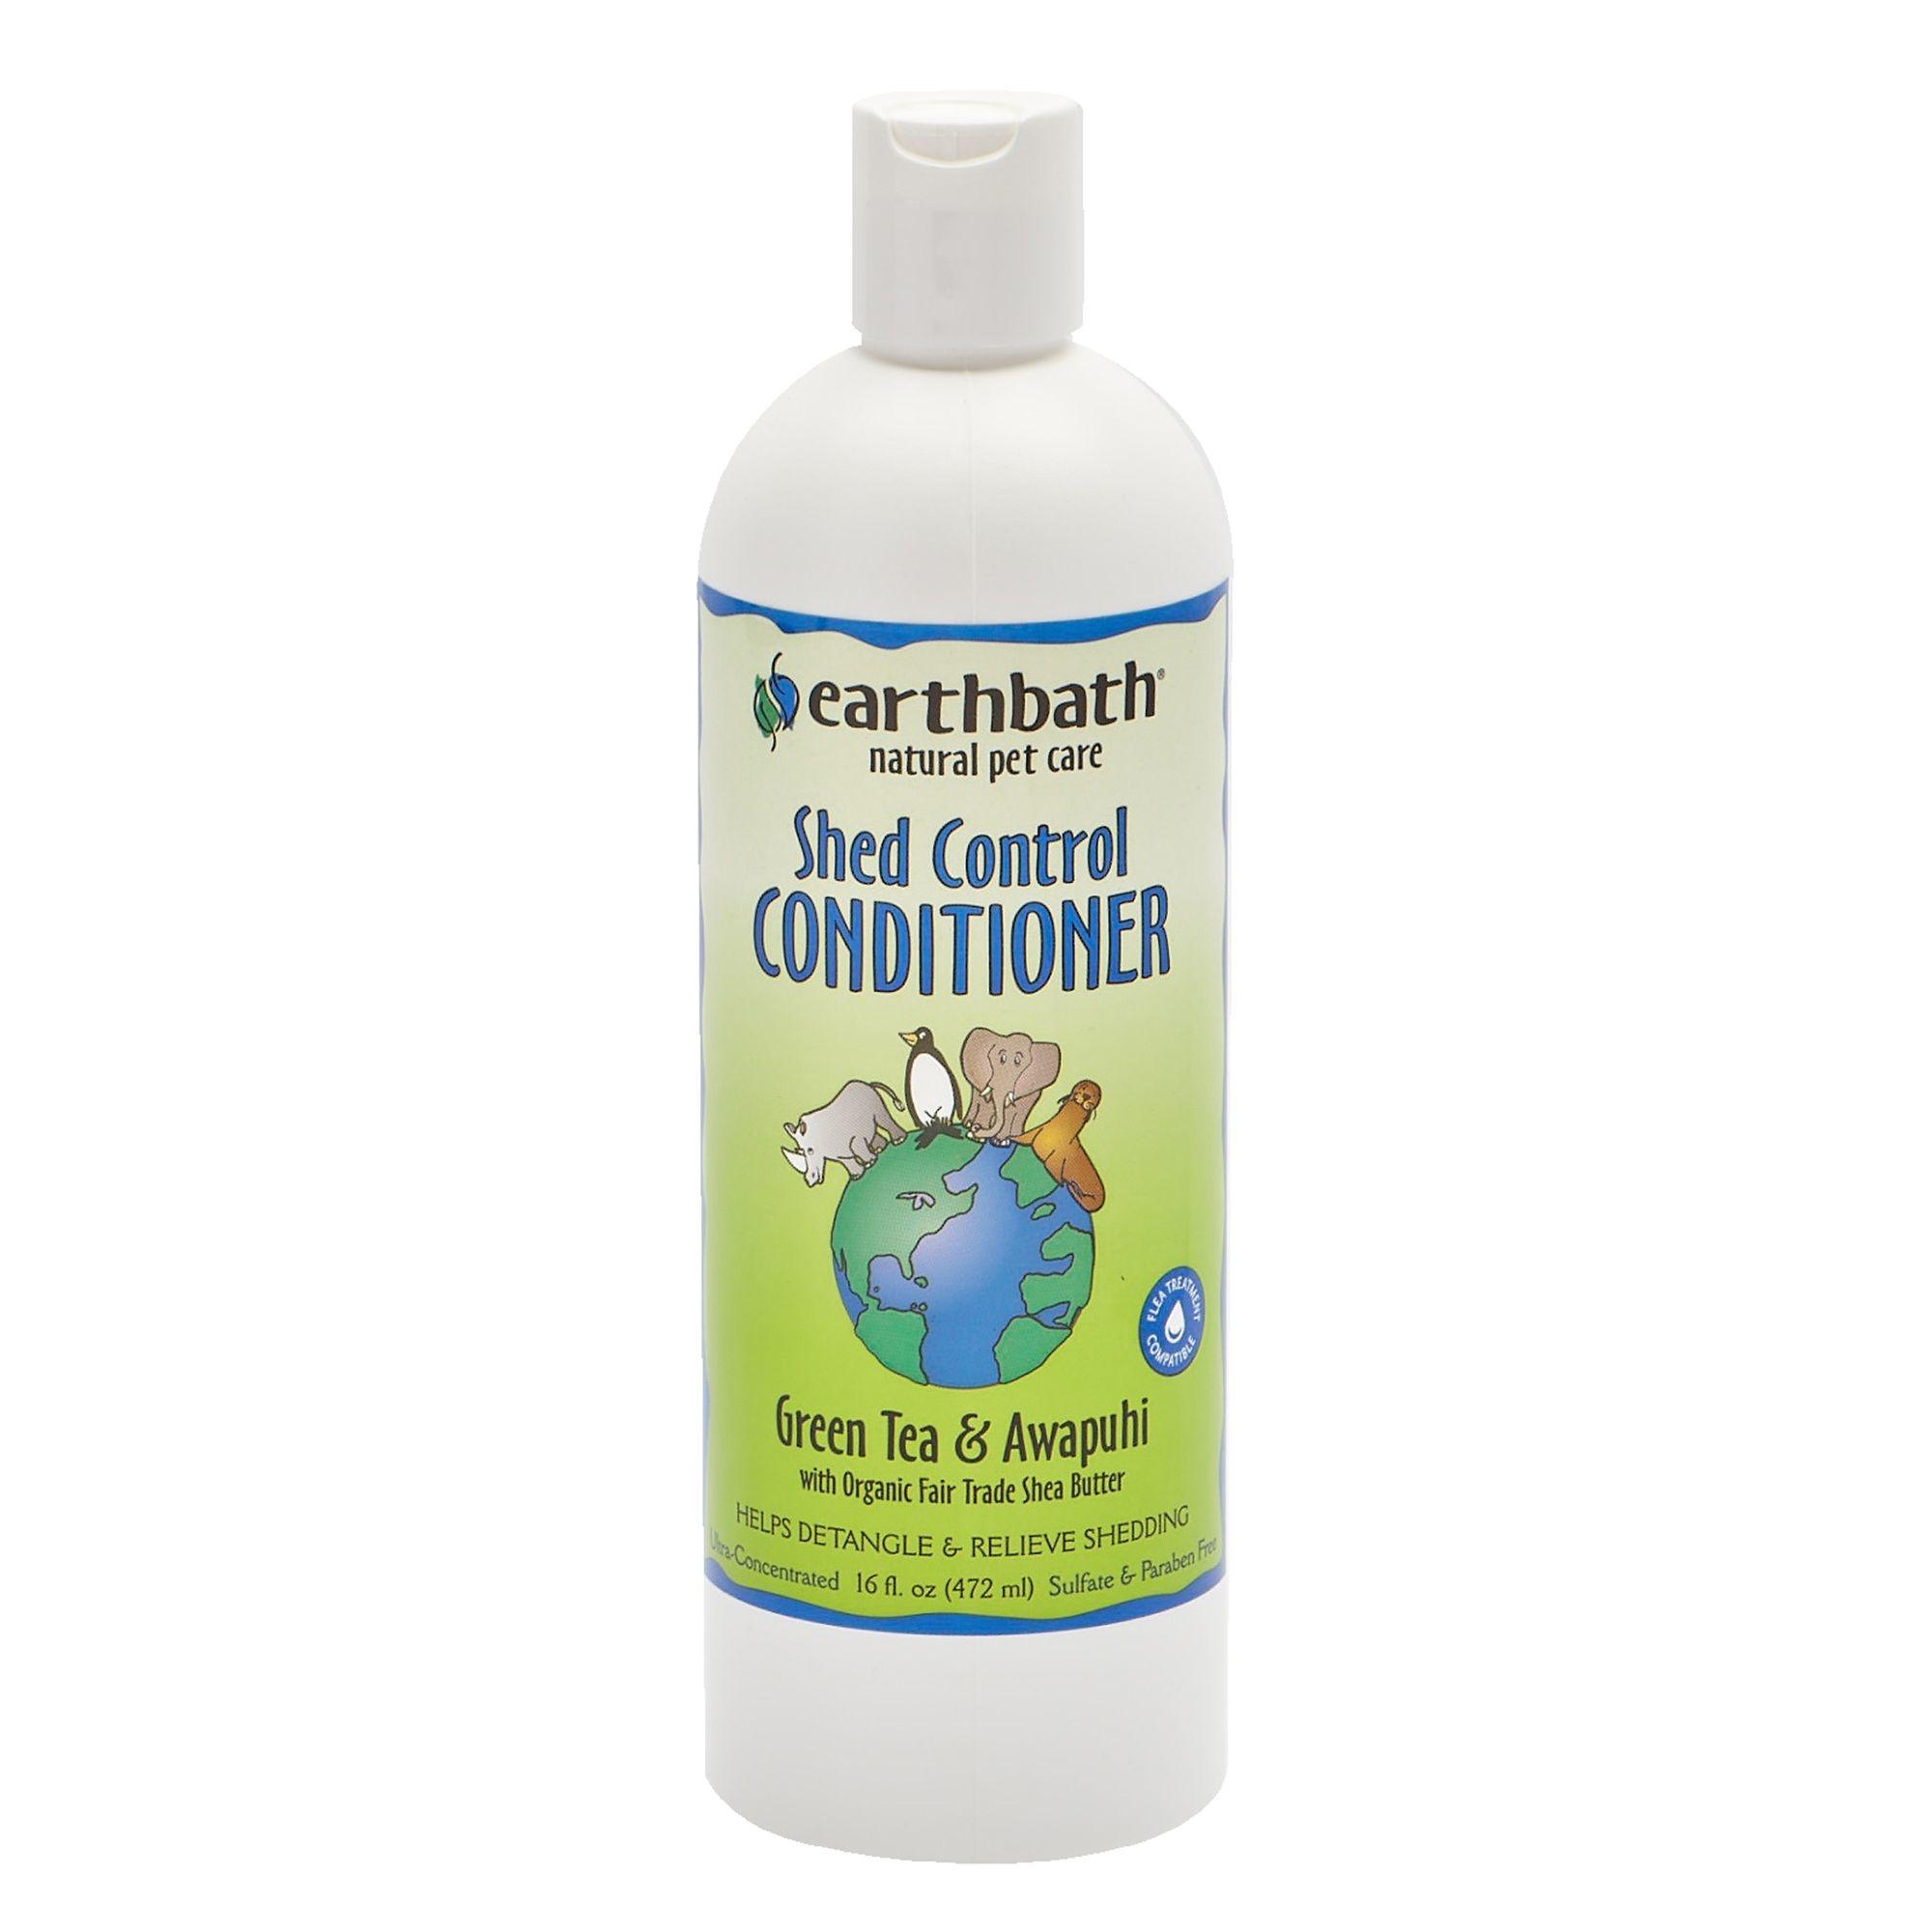 Earthbath Earthbath Shed Control Green Tea & Awapuhi Conditioner 16oz